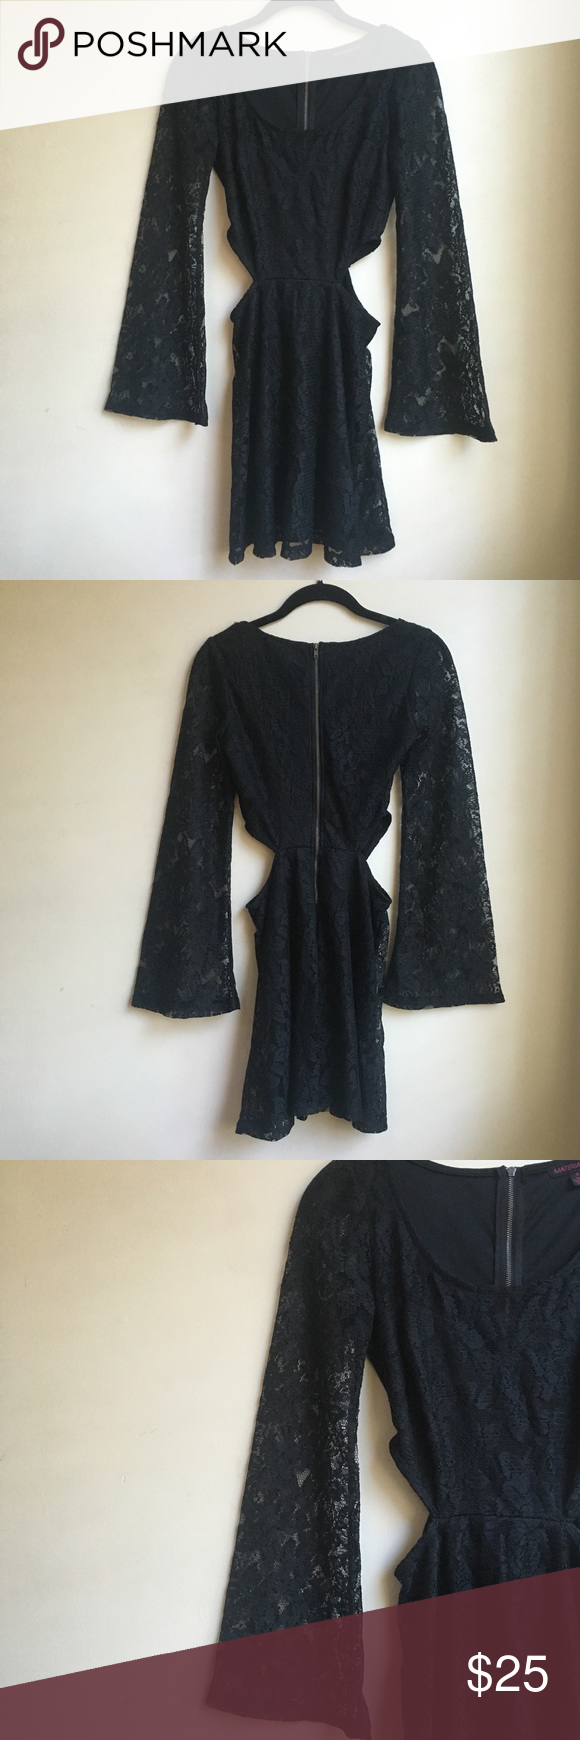 New material girl bell sleeve cutout black dress material girls